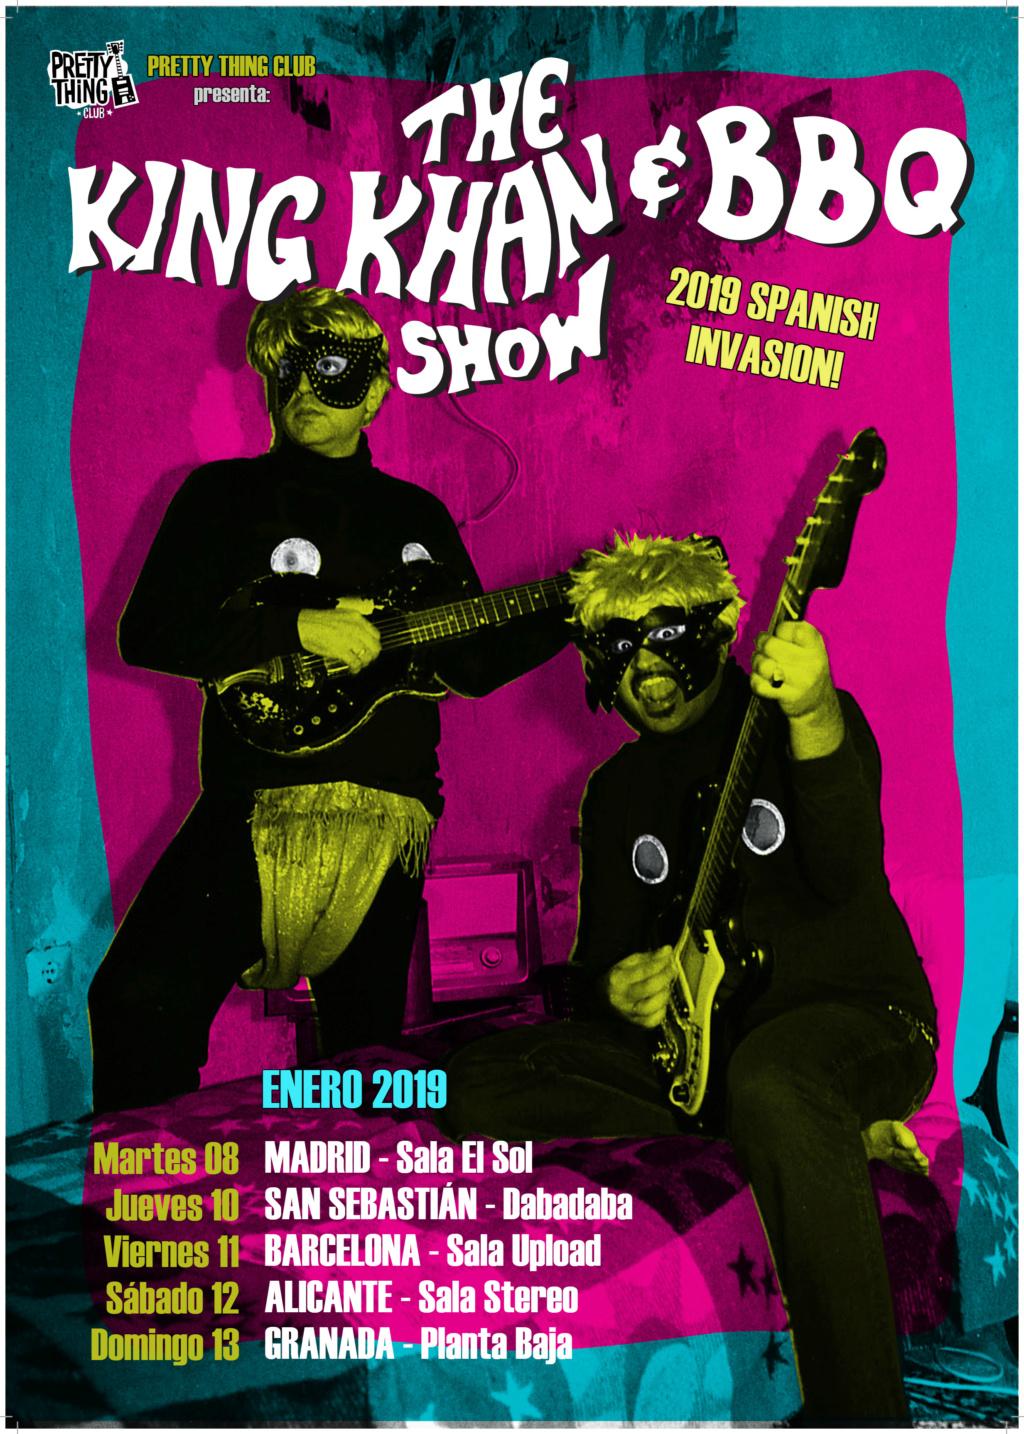 KING KHAN & BBQ SHOW en gira del 8-13 Enero 2019 Poster10